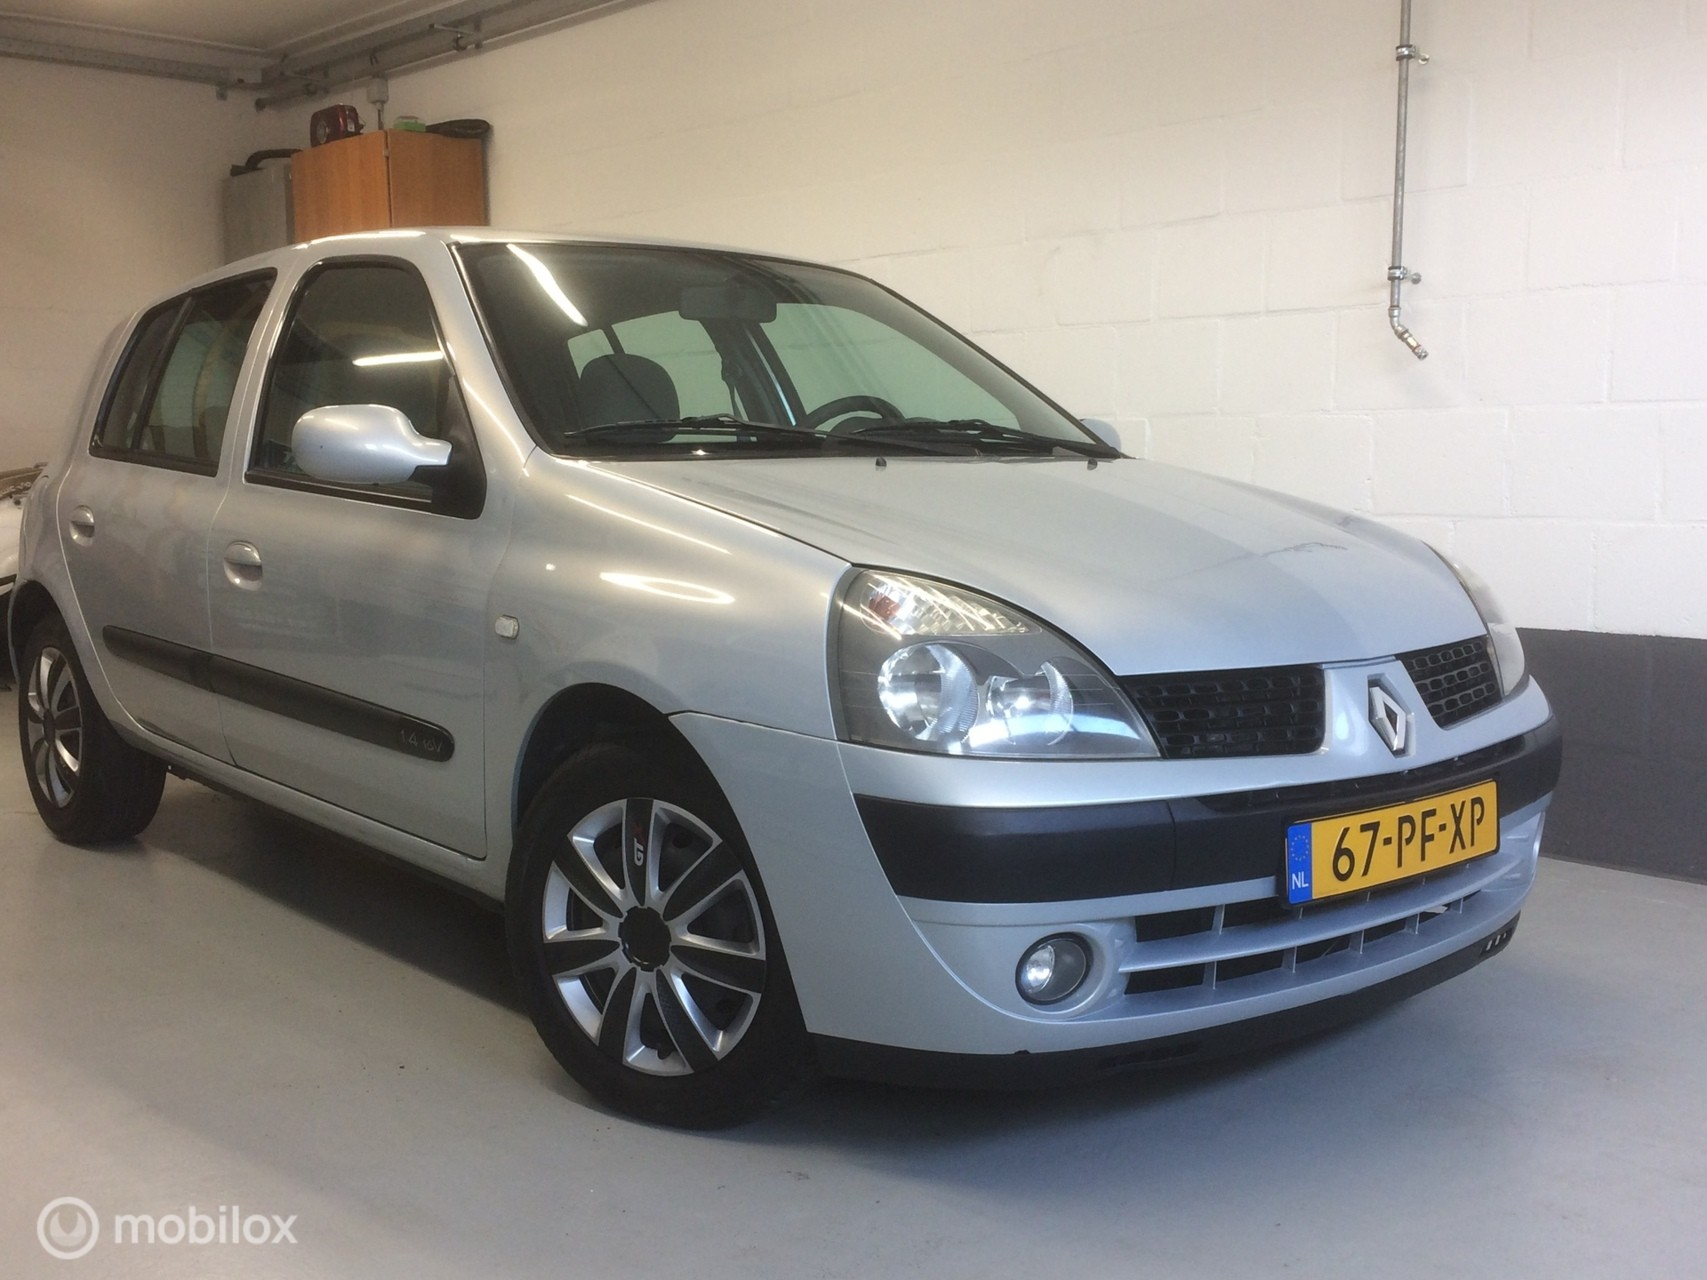 Renault Clio II 1.4-16V Dynamique Comfort